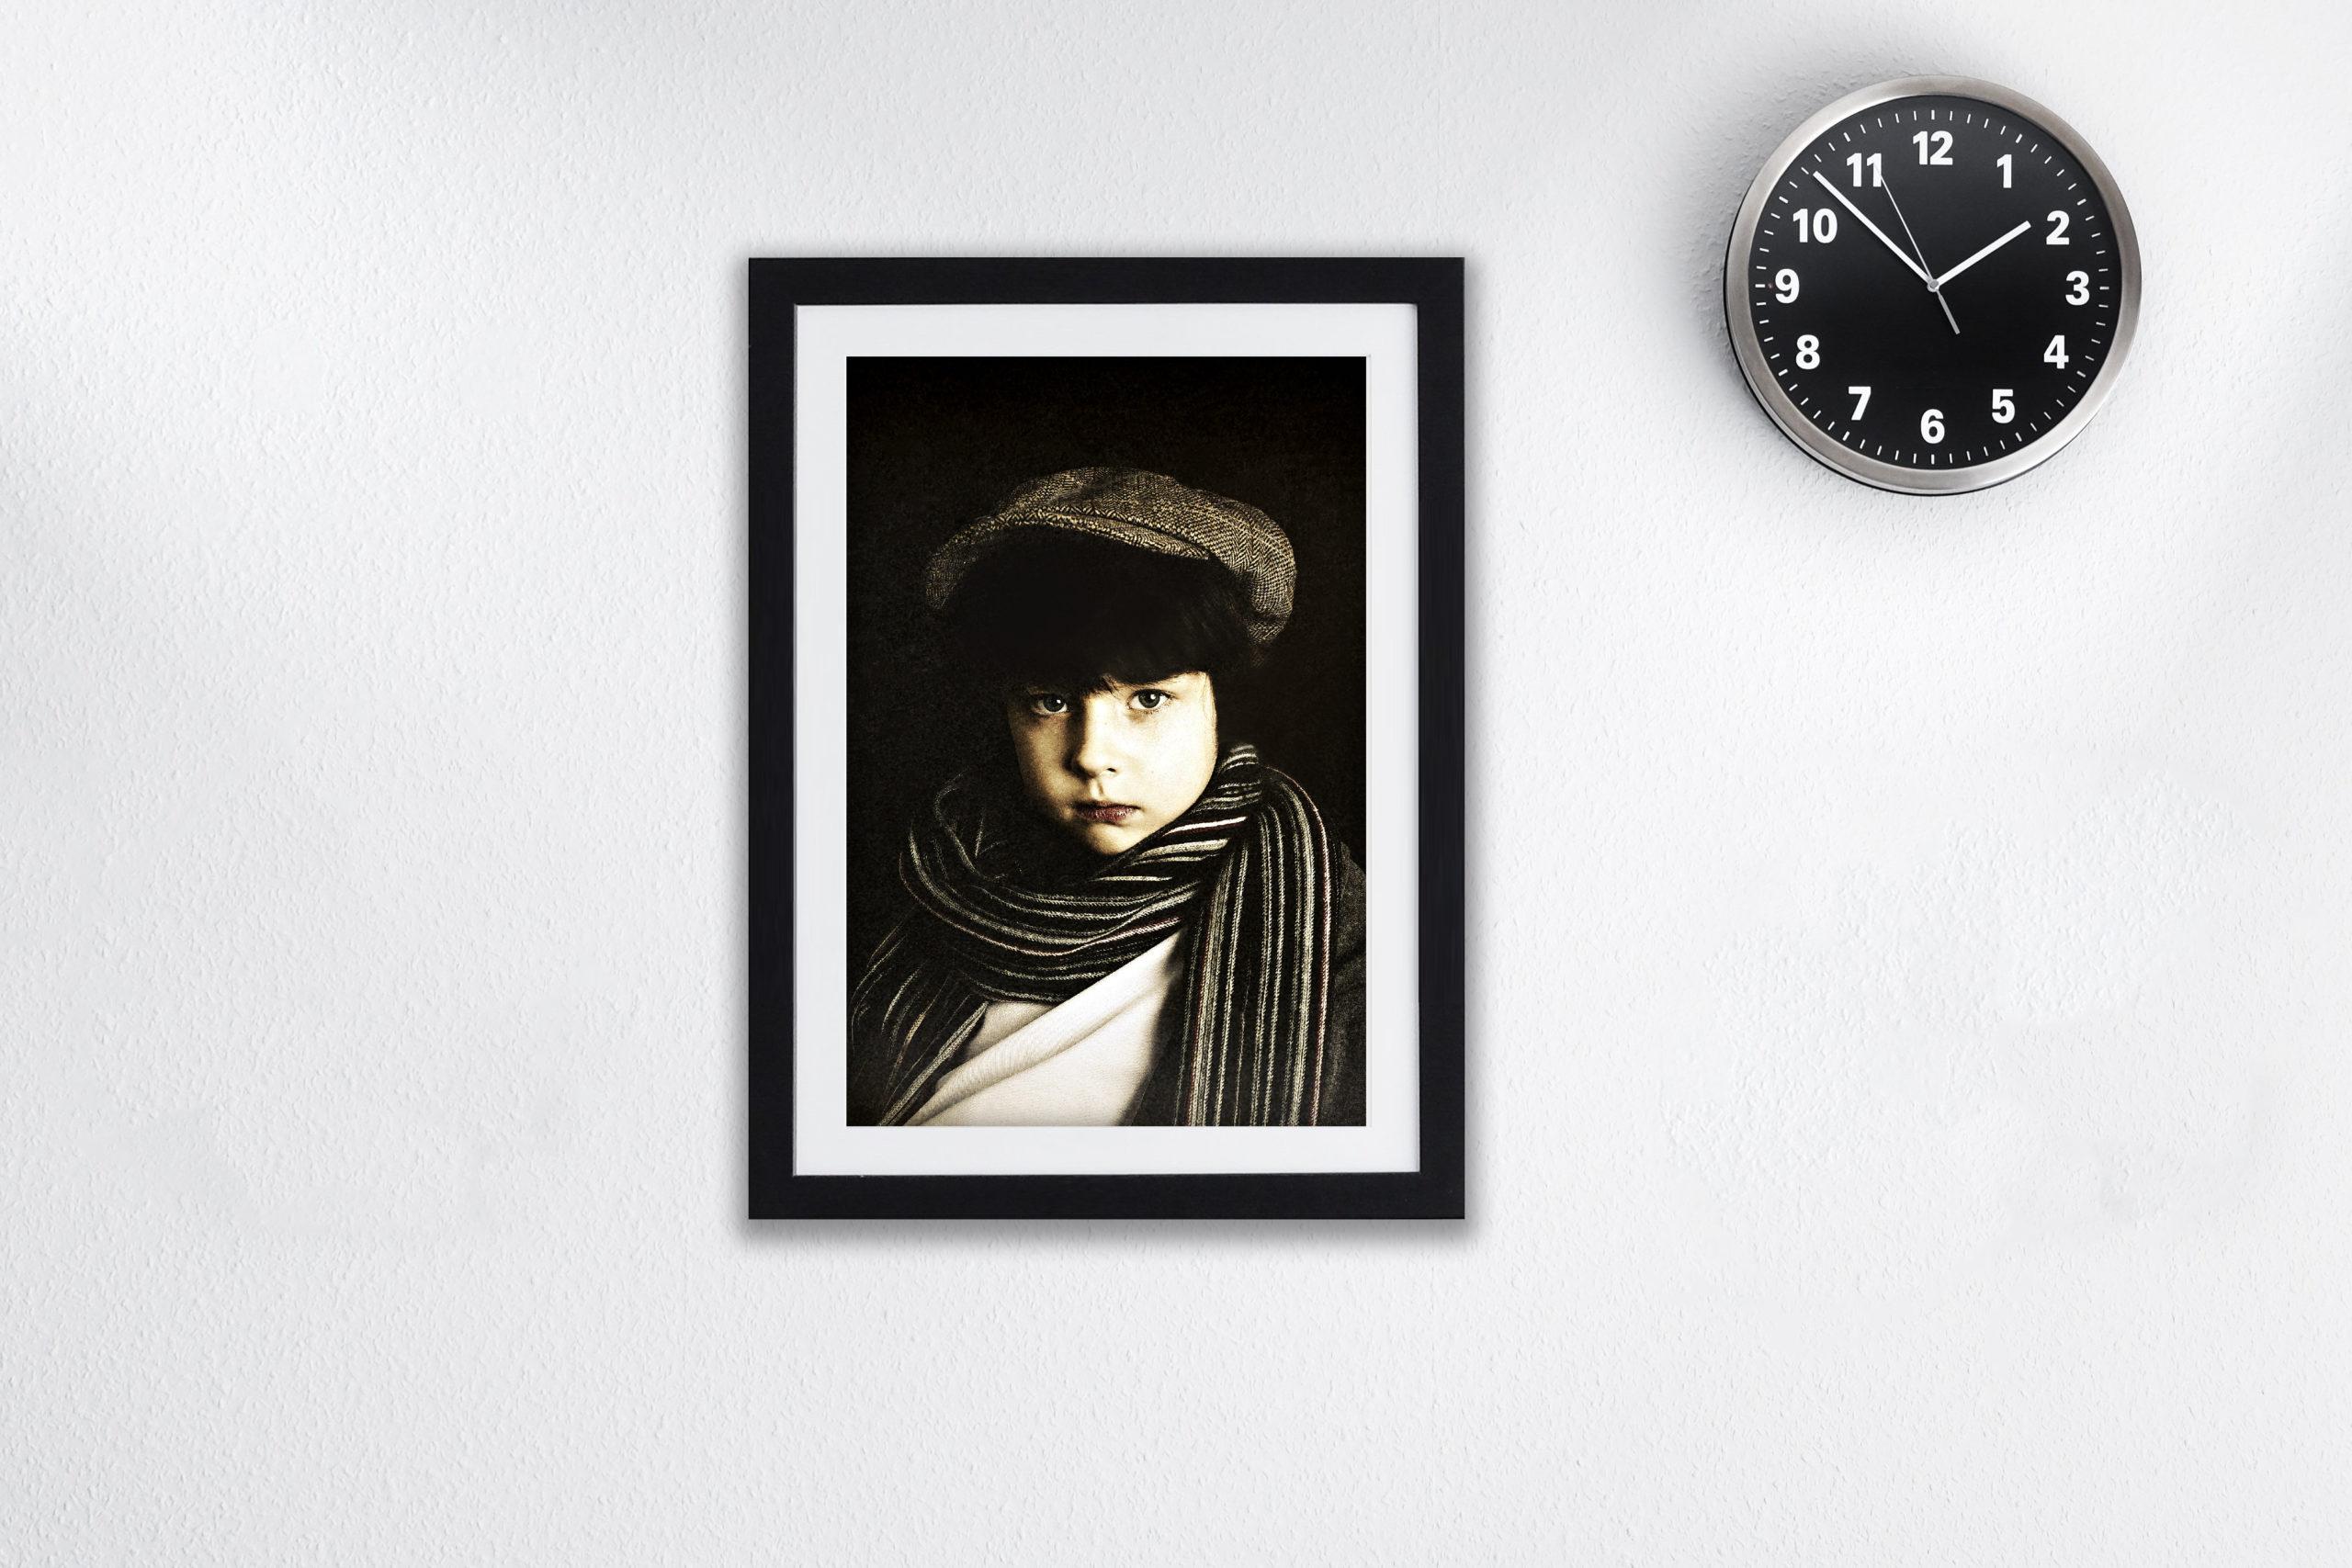 sensivia-photographe_portrait-comedien-aix-en-provence-